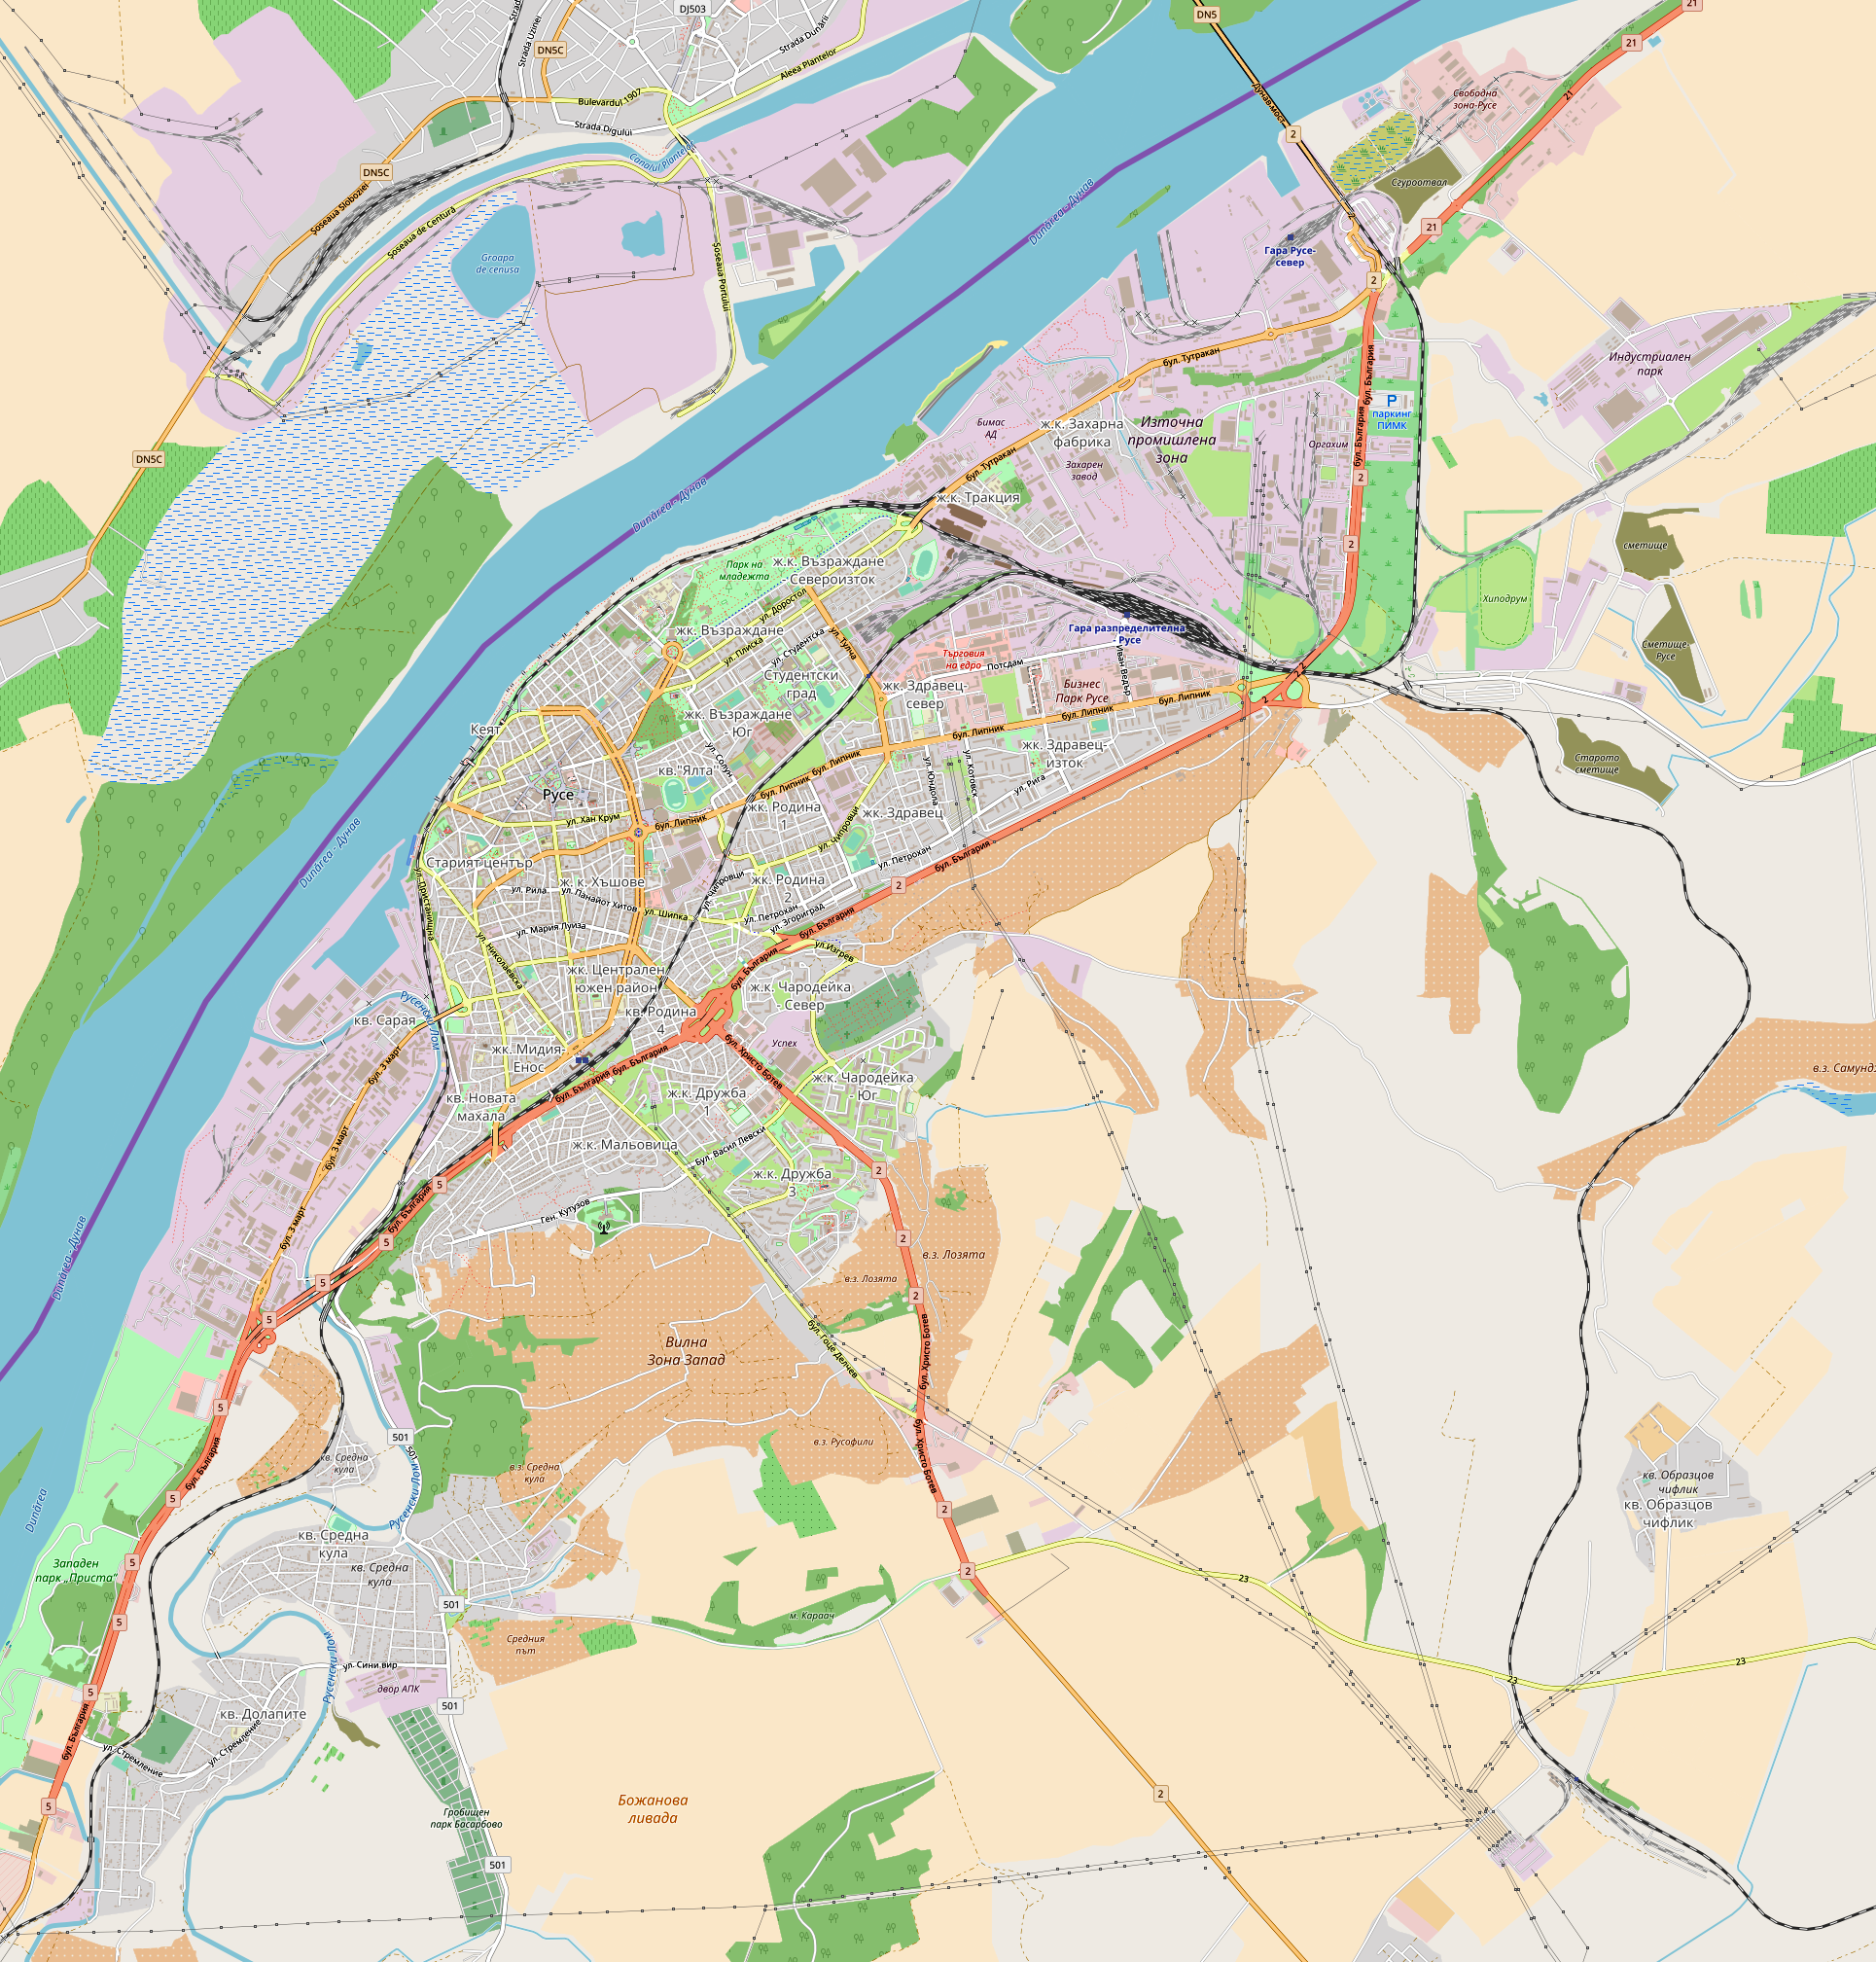 FileMap of Rusepng Wikimedia Commons